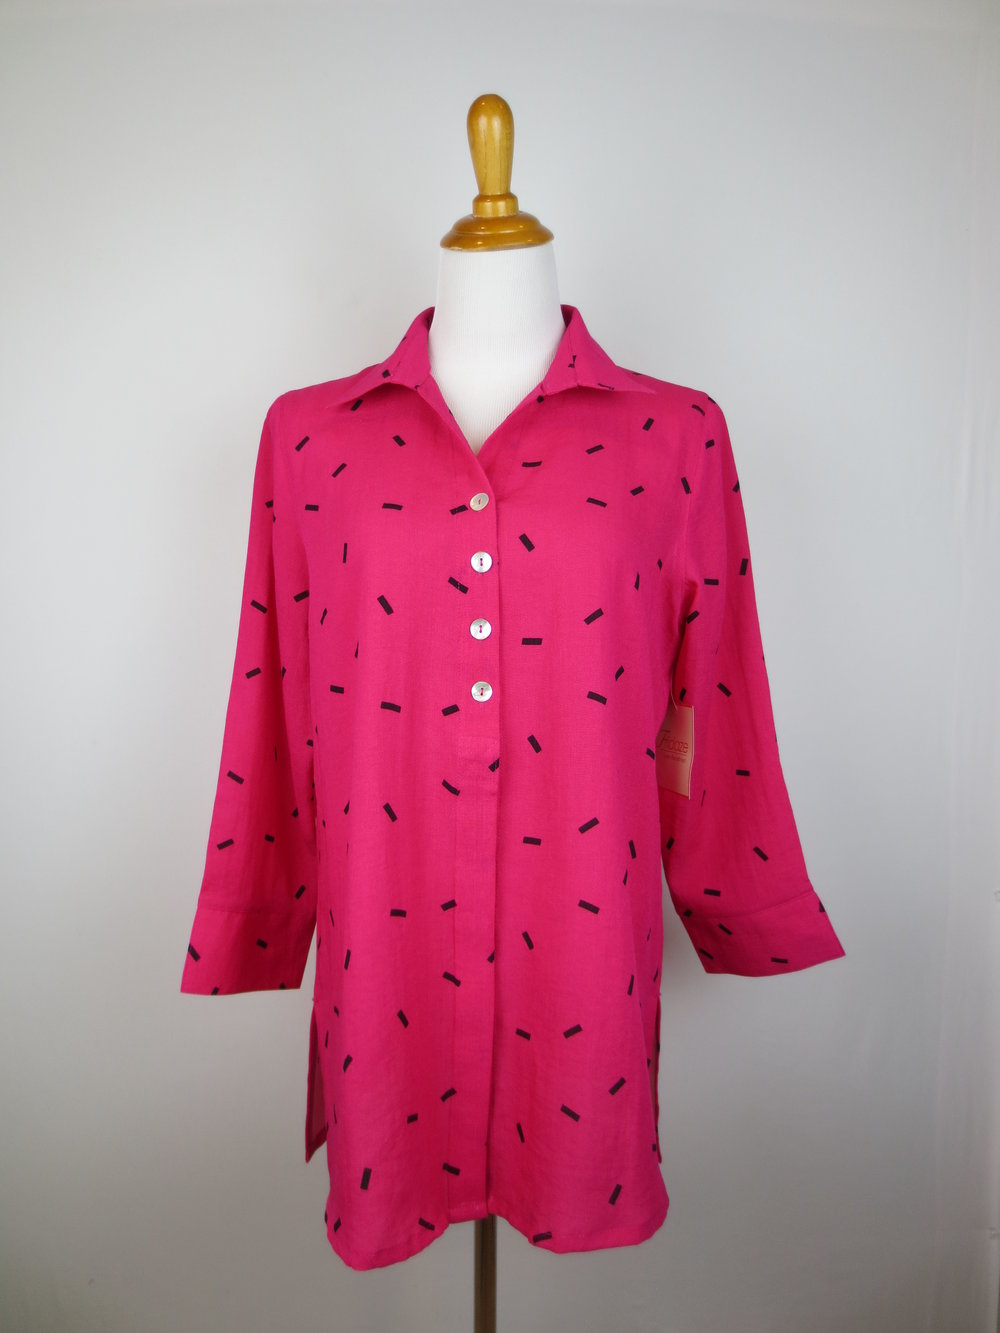 AA192 - Camellia Rectangles (1).JPG